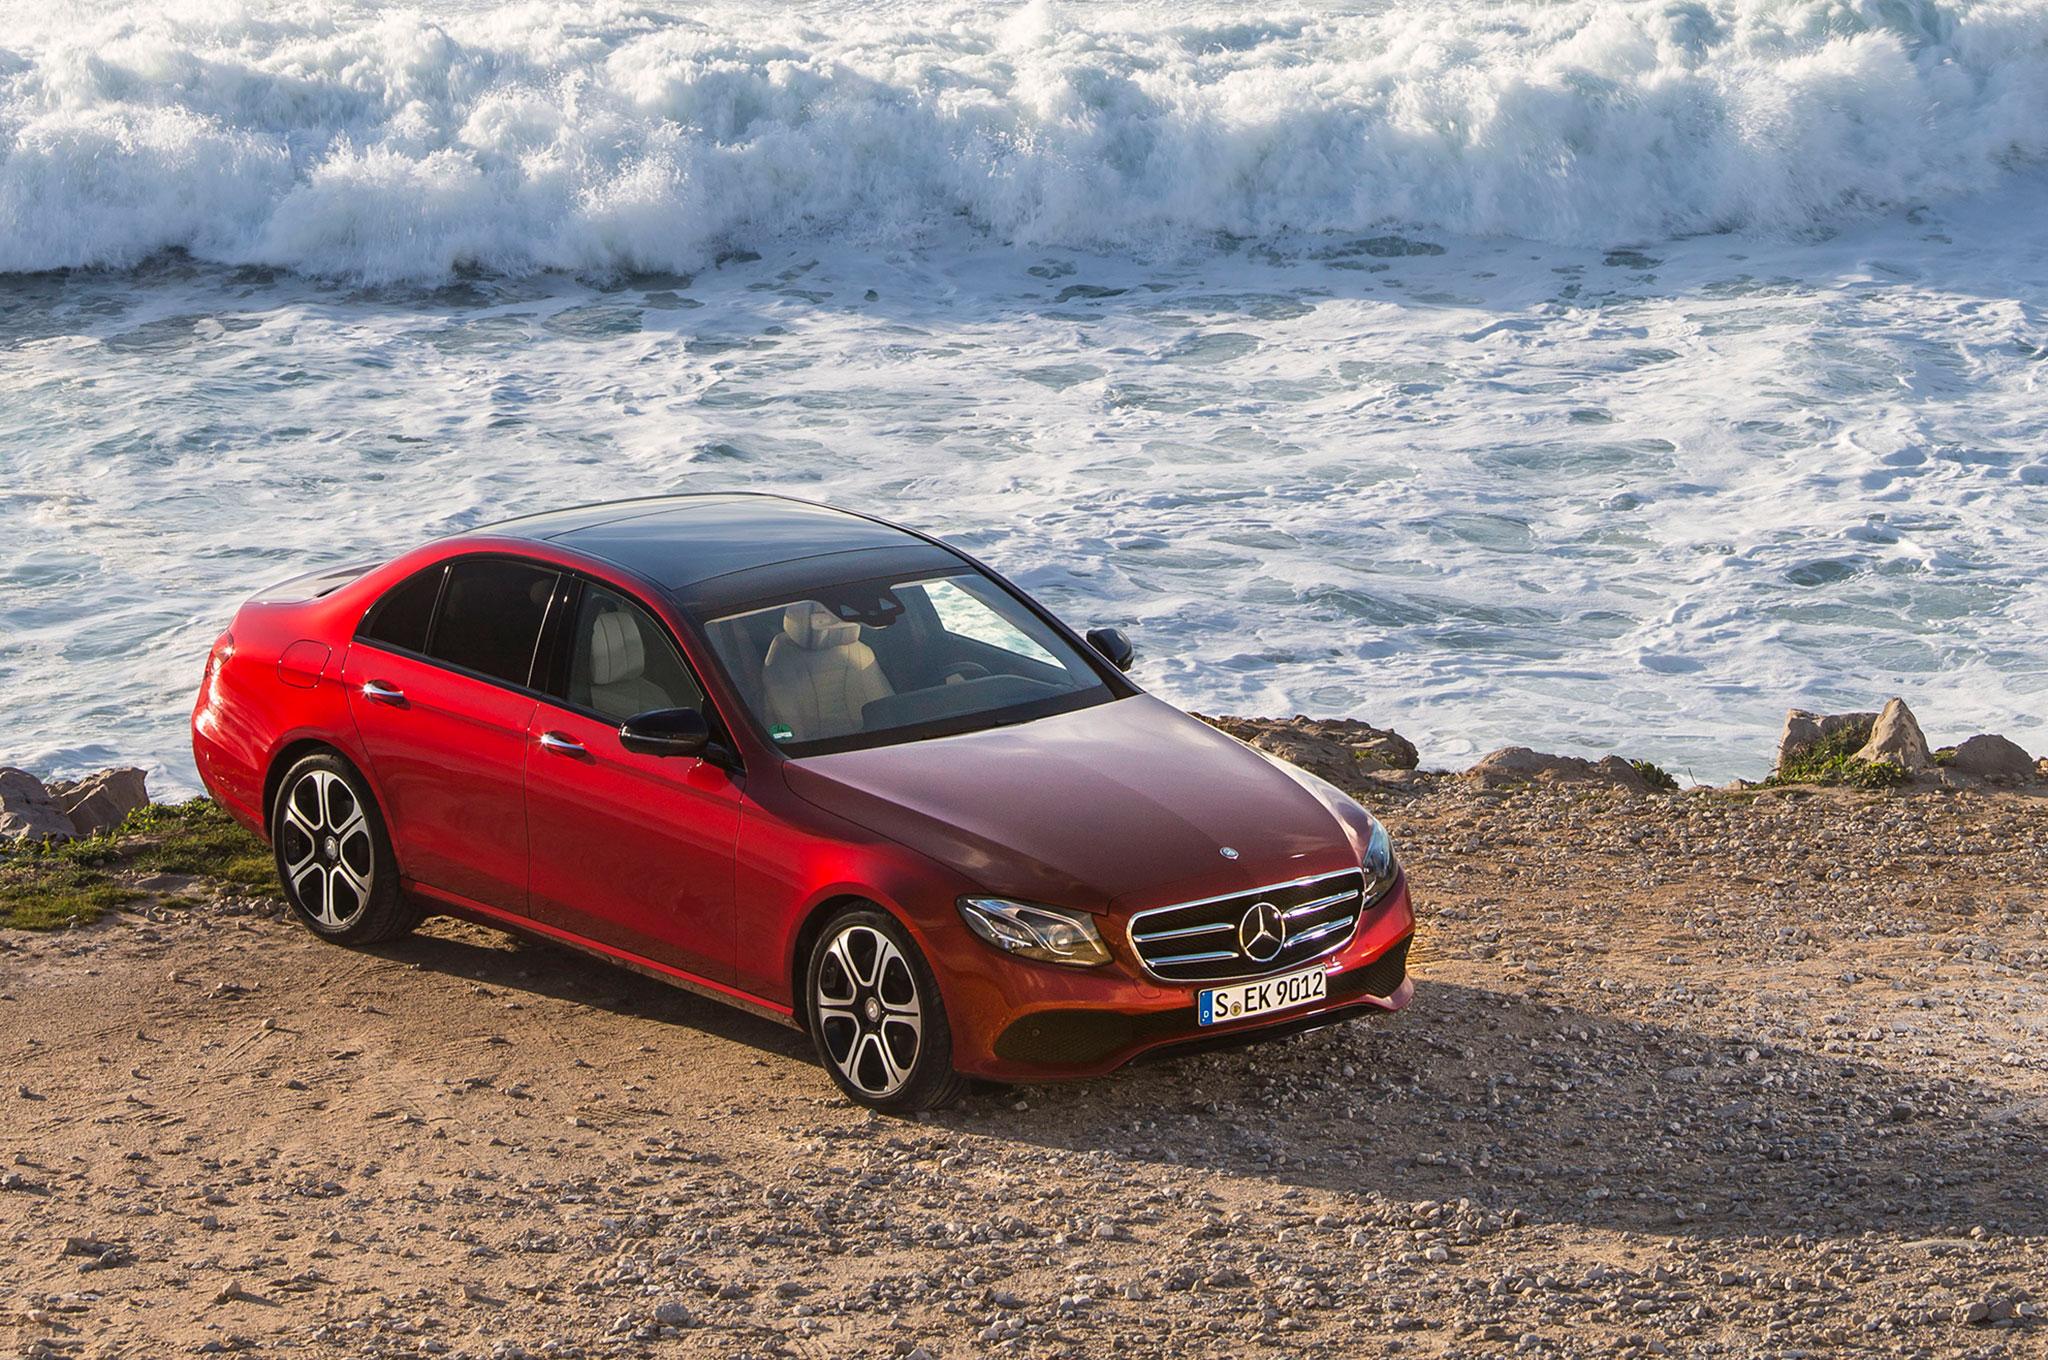 2017 mercedes benz e300 review automobile magazine for 2017 mercedes benz e300